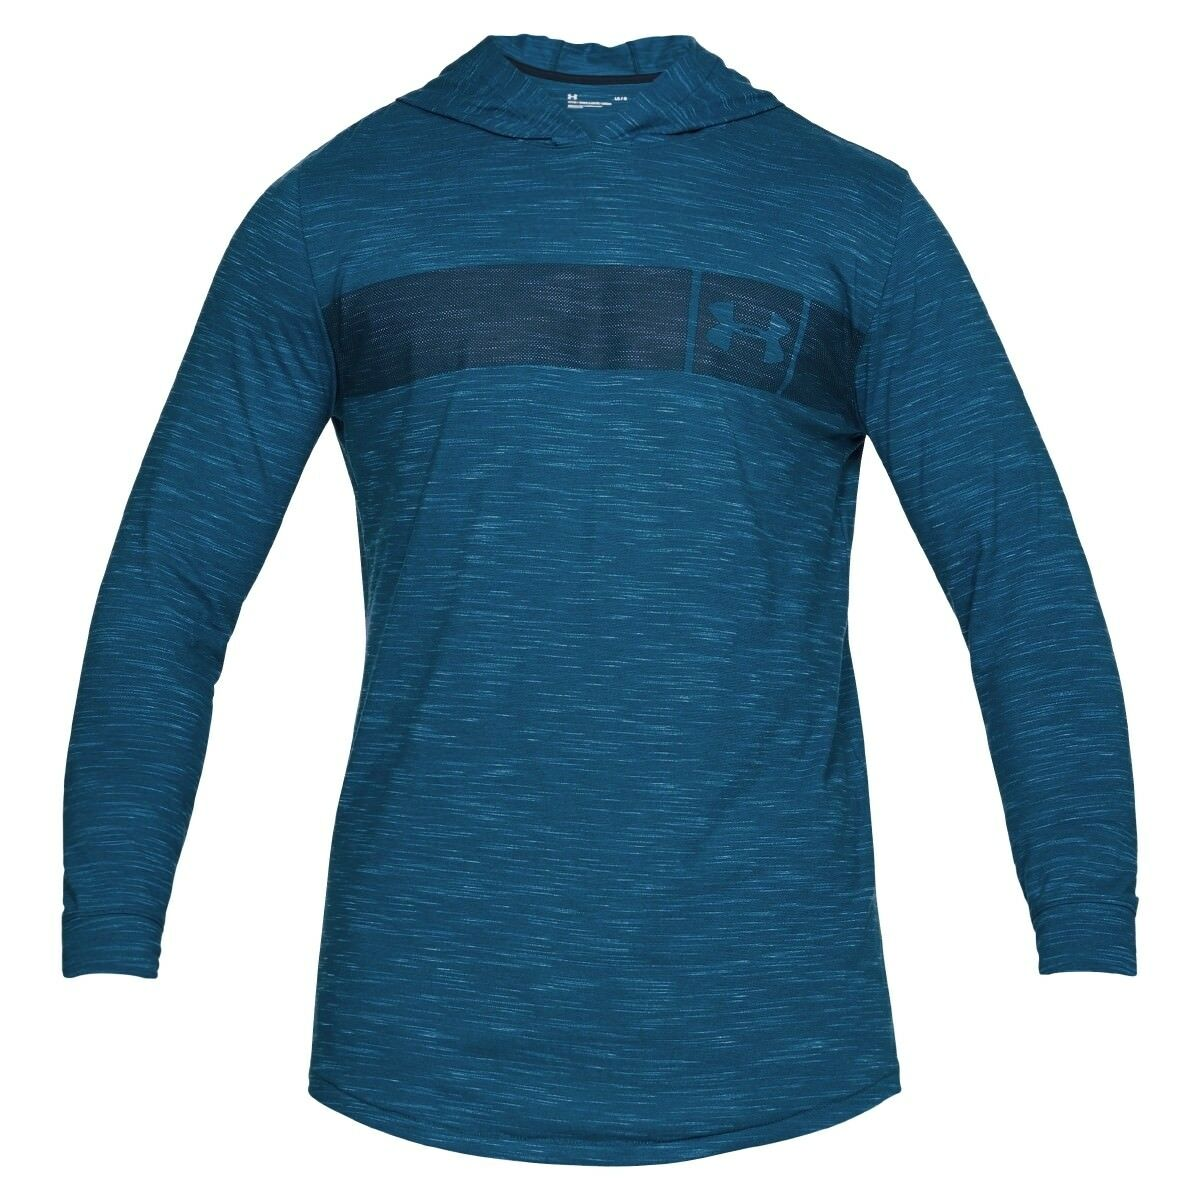 Under Armour Sportstyle Core Hoodie Herren Kapuzen Pullover Blau 1306490-487     | Überlegen  | Feinbearbeitung  | Rabatt